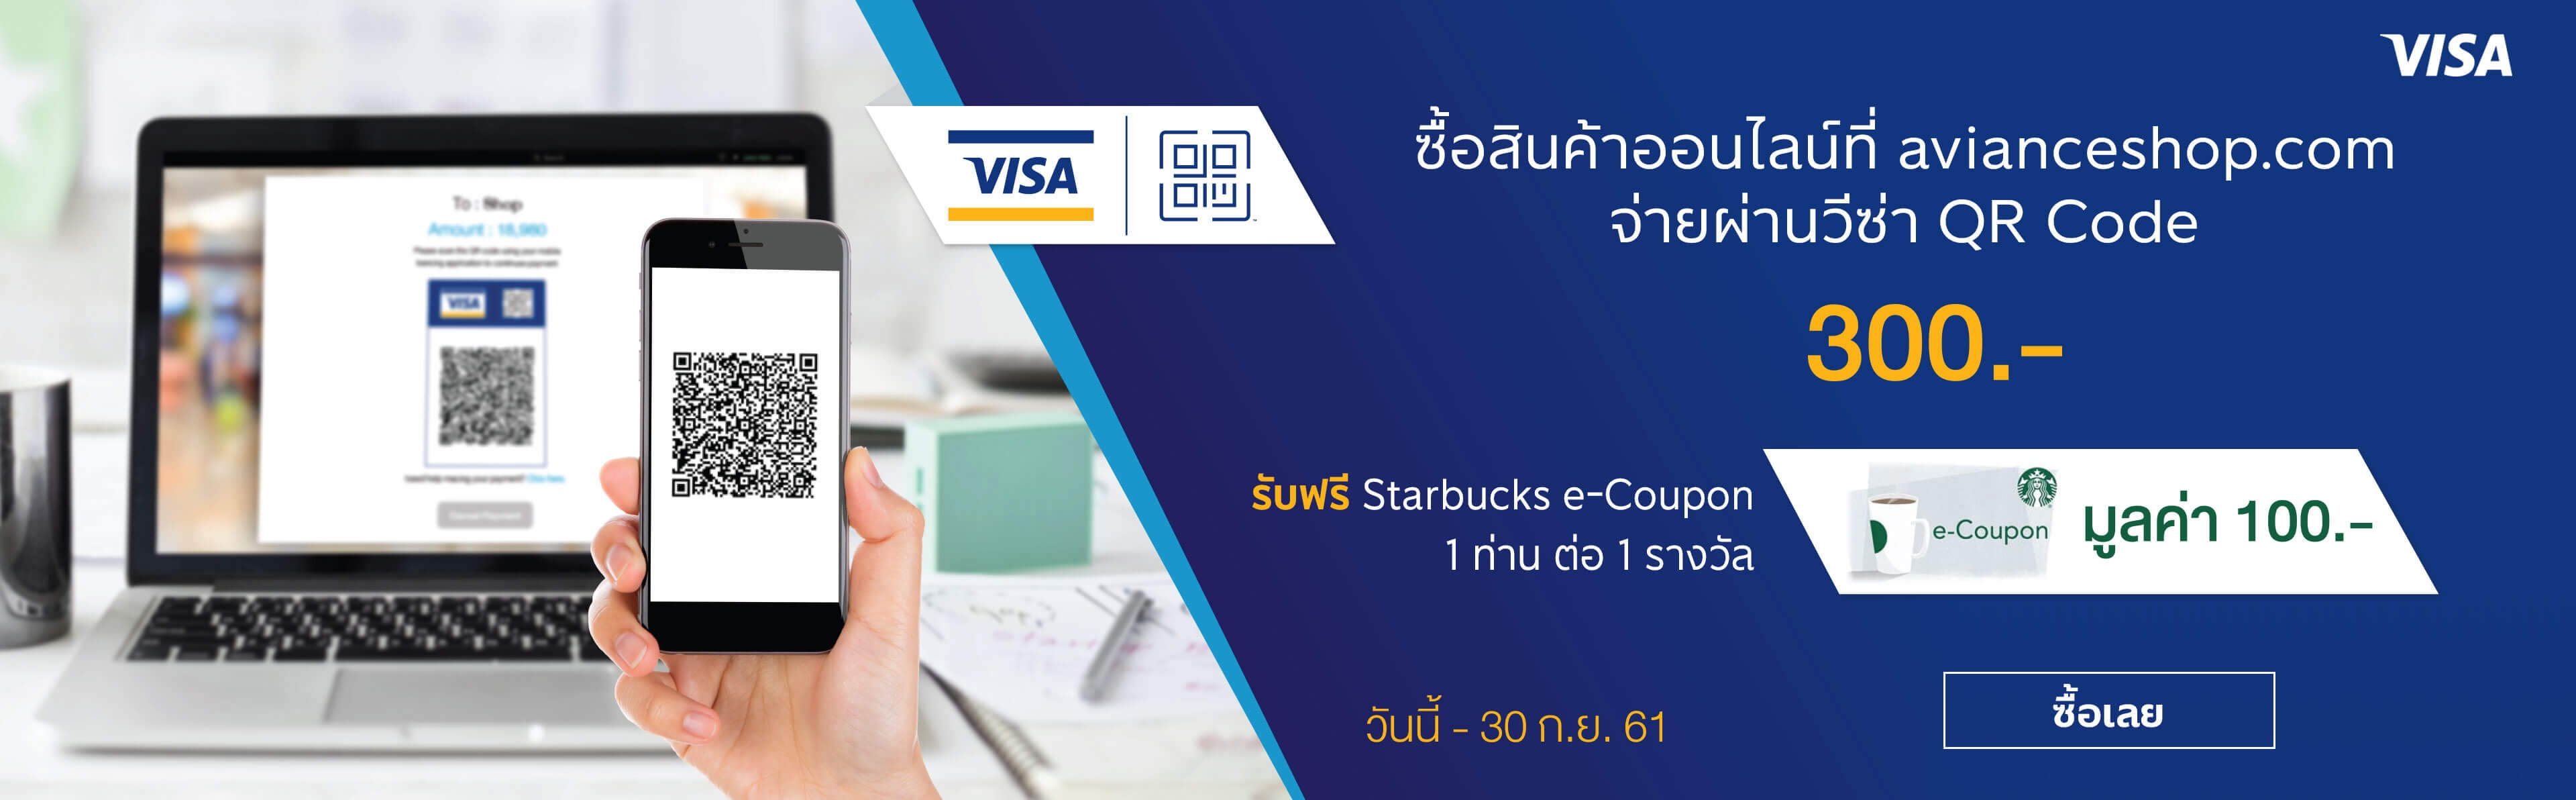 Get free Starbucks gift card by using VISA QR-code now